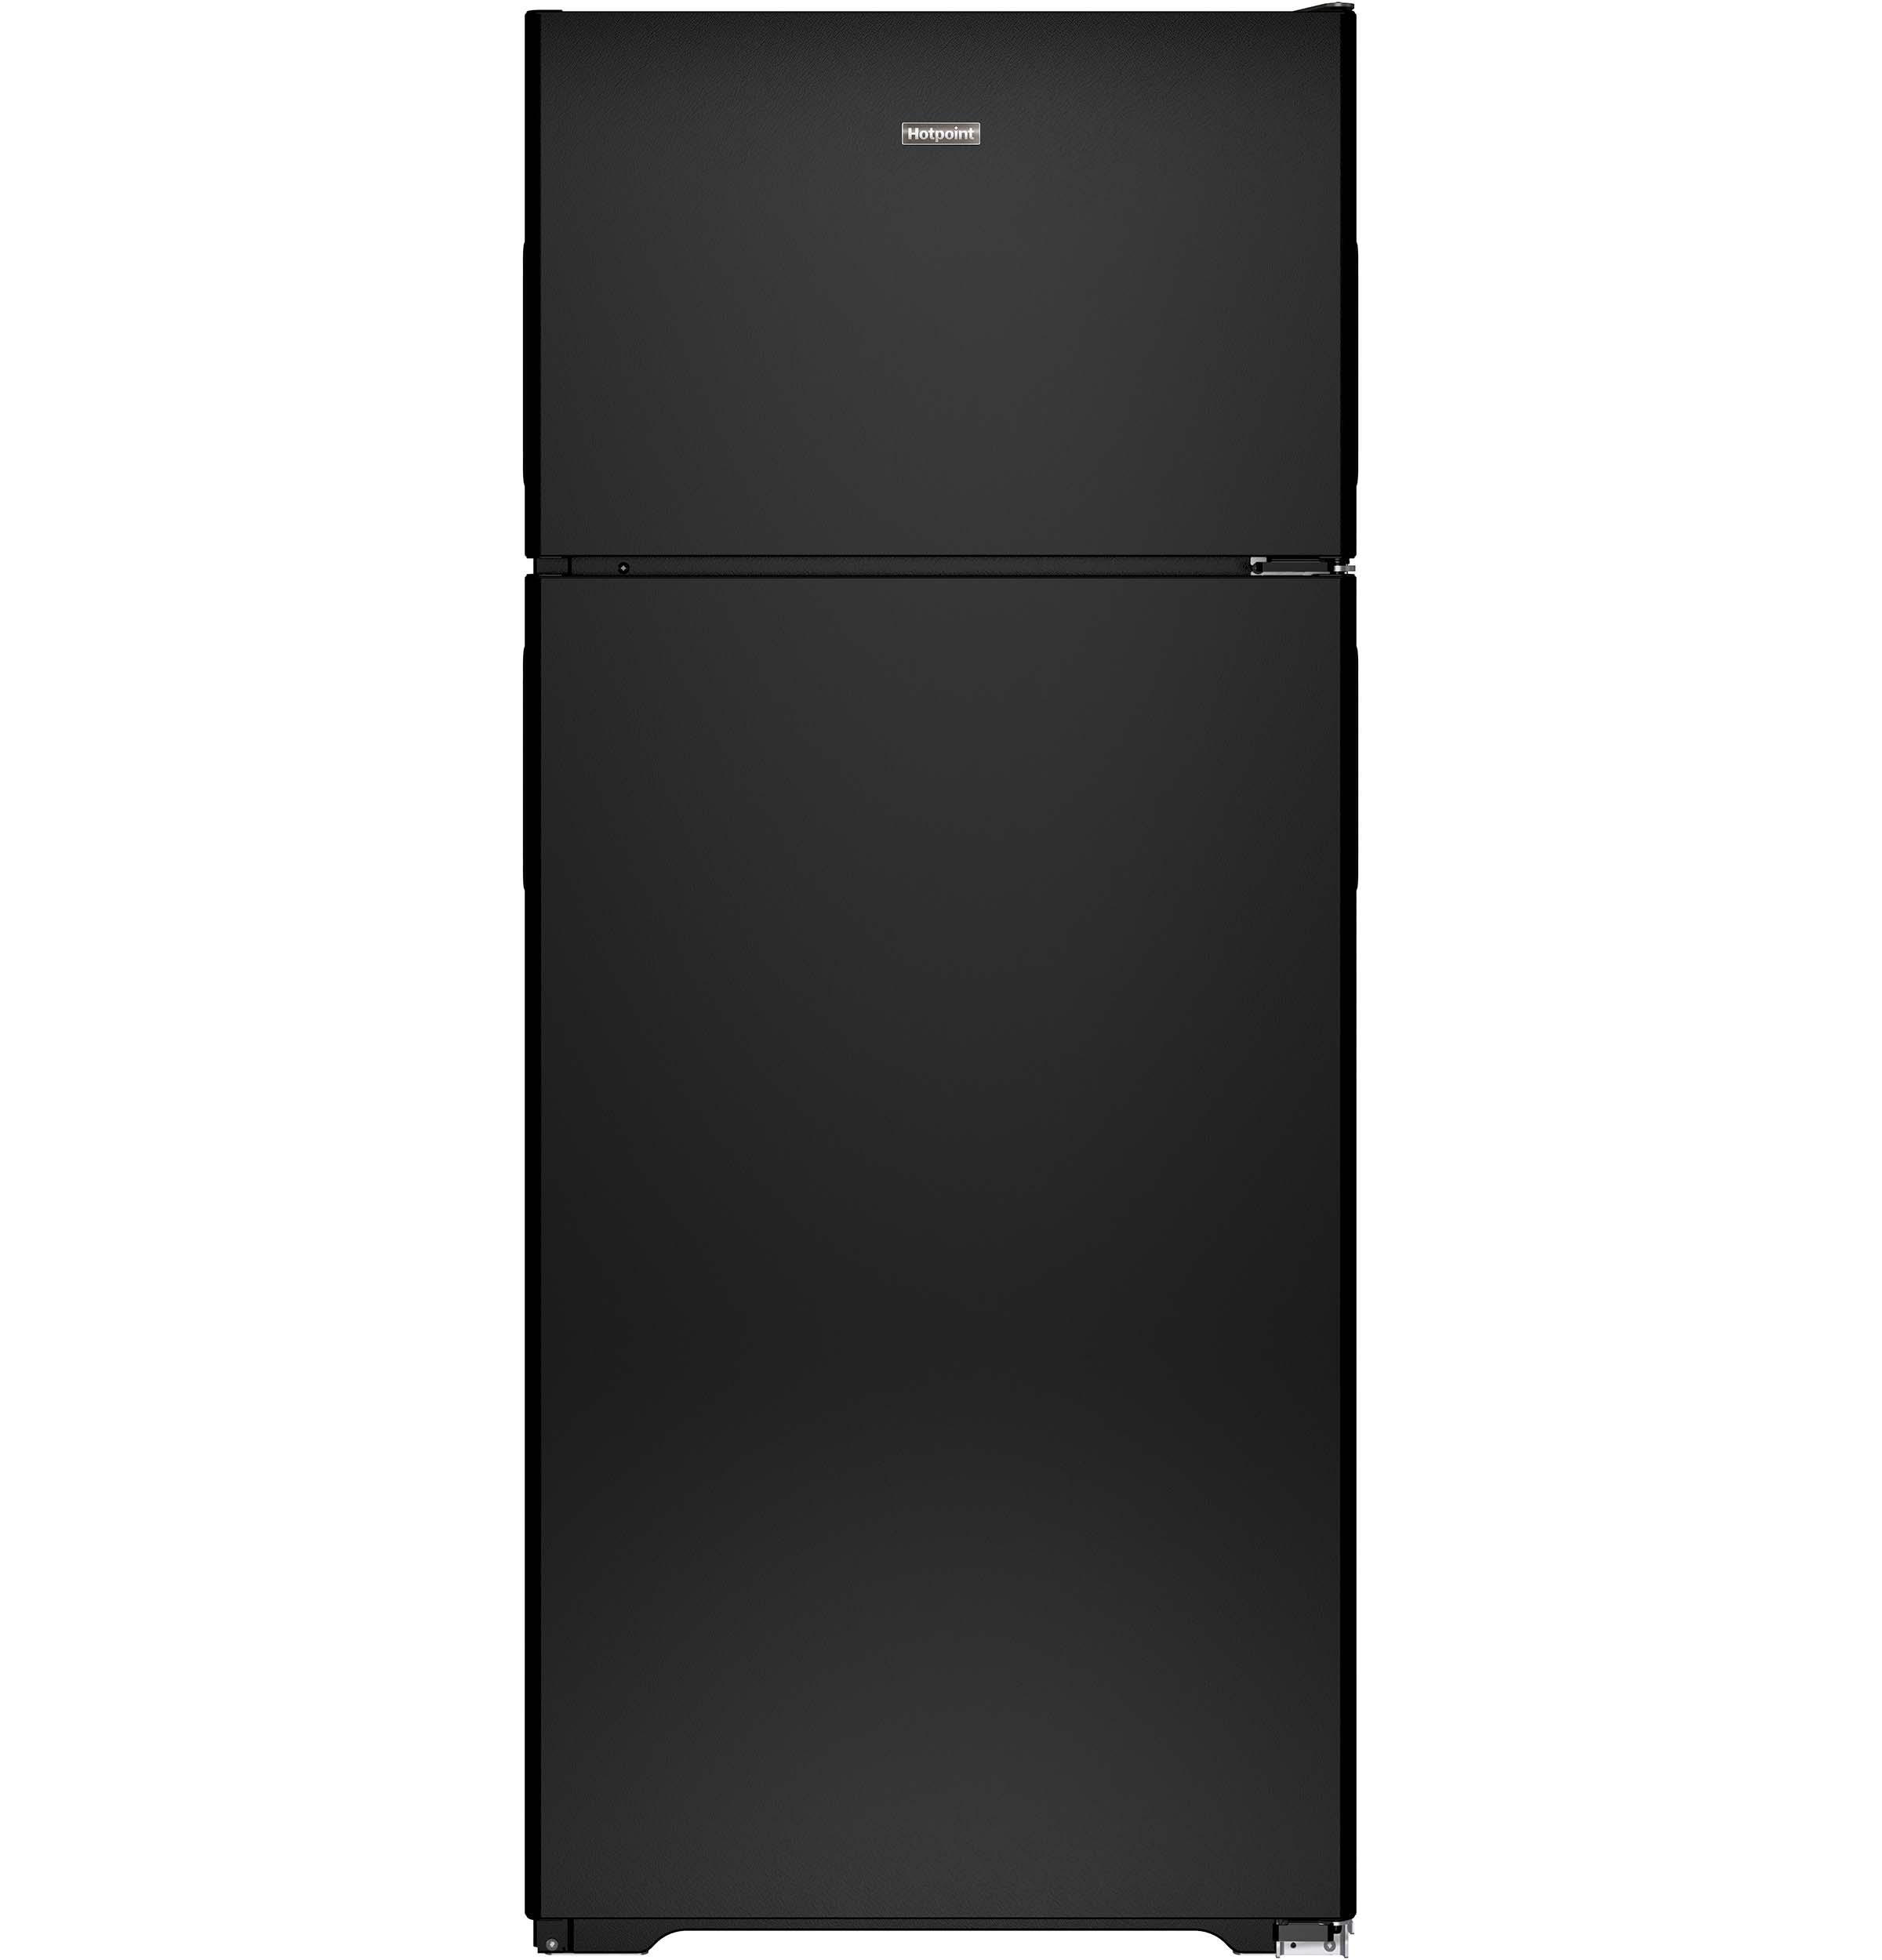 Hotpoint® 17.6 Cu. Ft. Top-Freezer Refrigerator